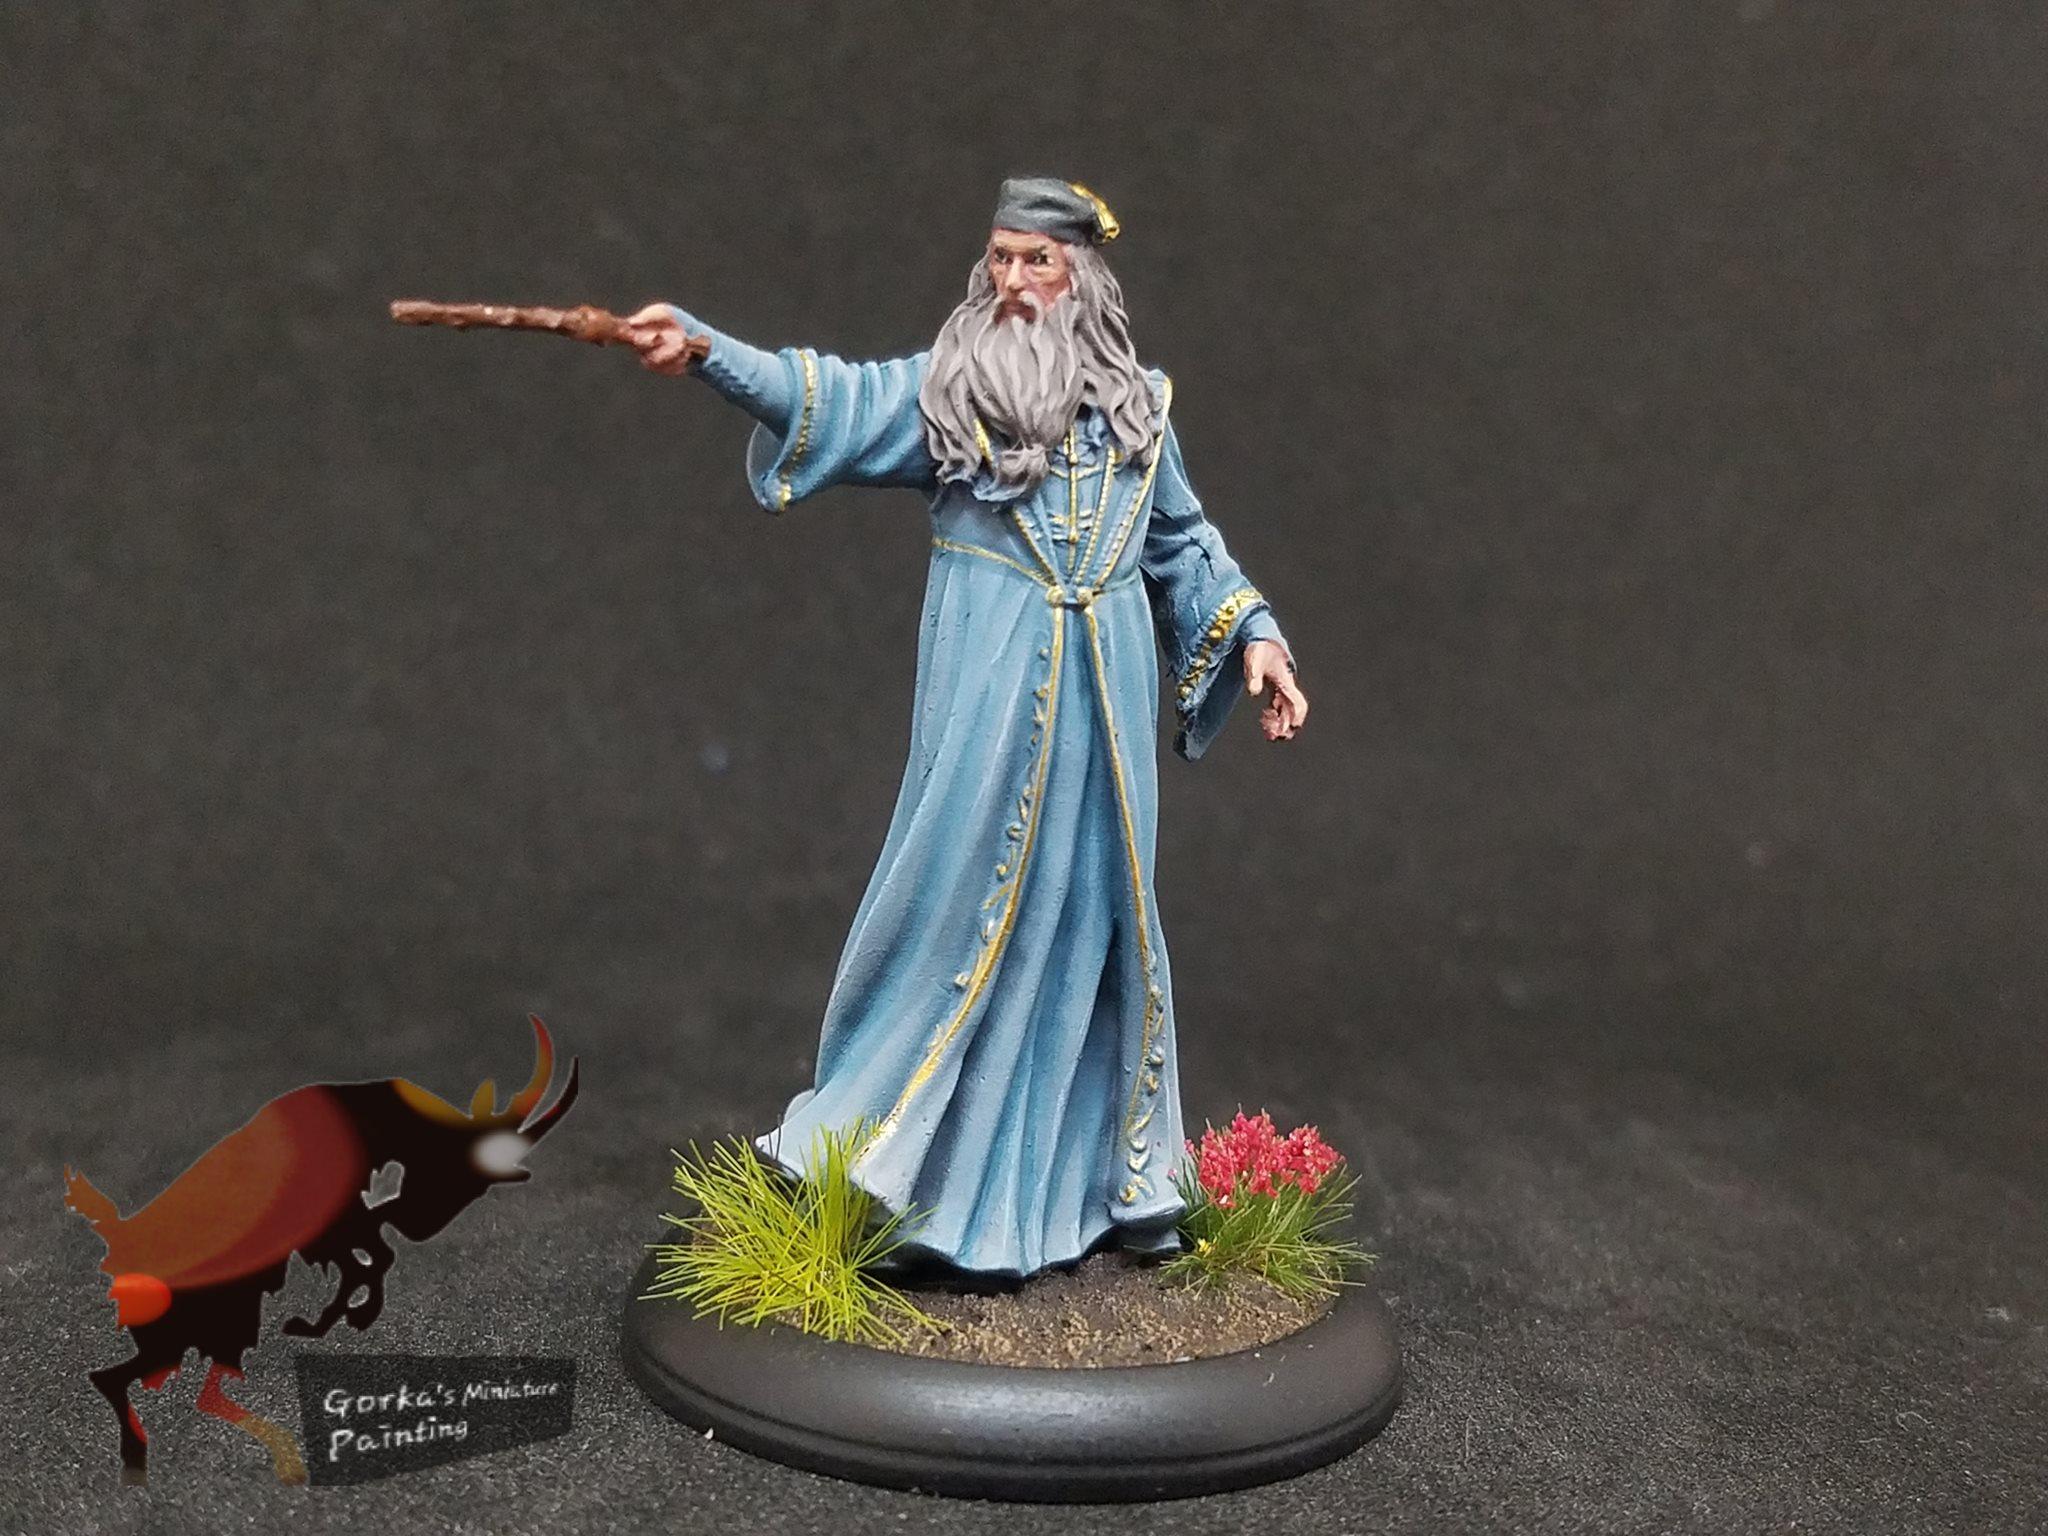 Dumbledore - C Gorka